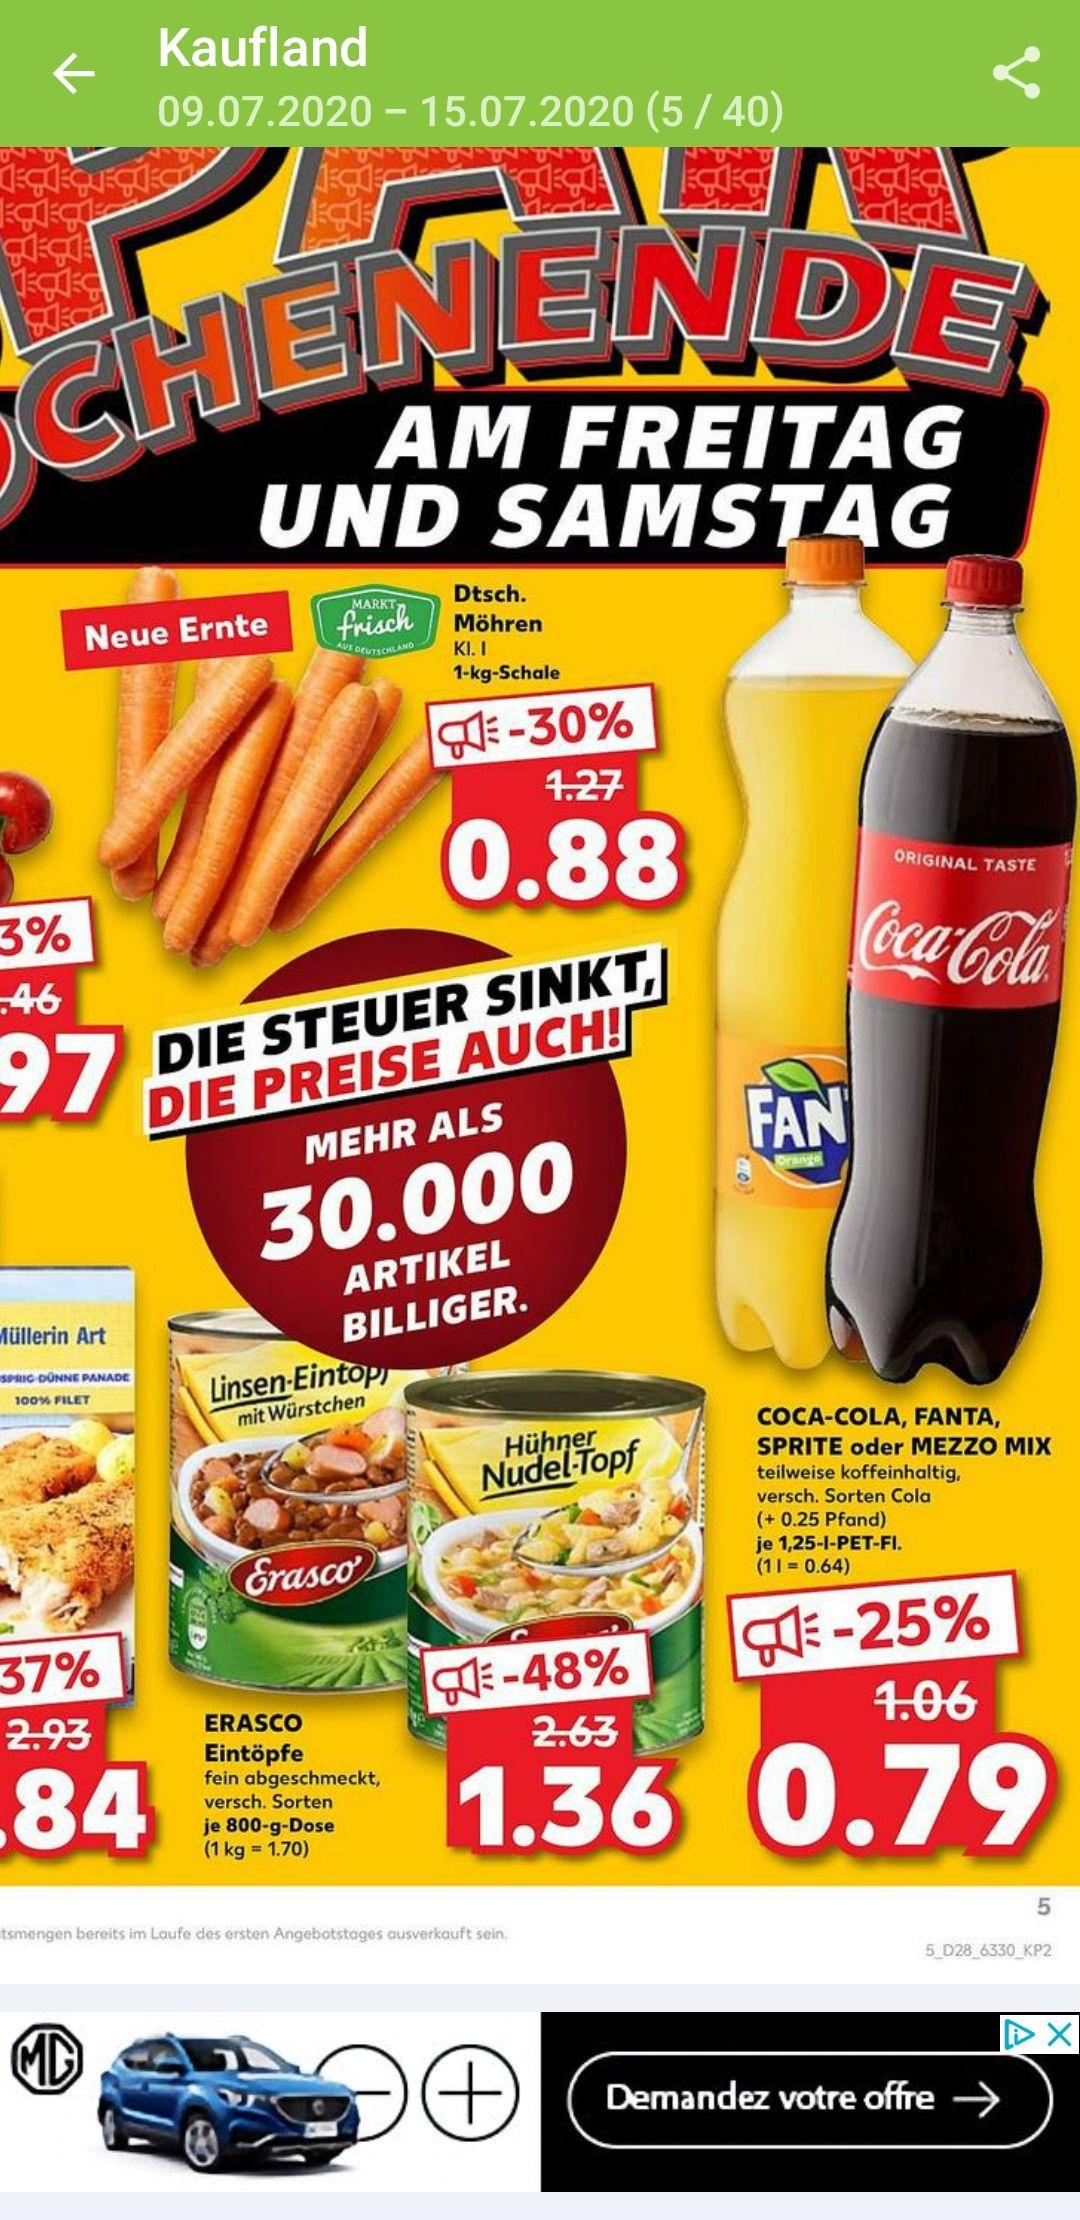 Grensdeal Kaufland Duitsland. Coca Cola 0,79€ per 1,25liter fles